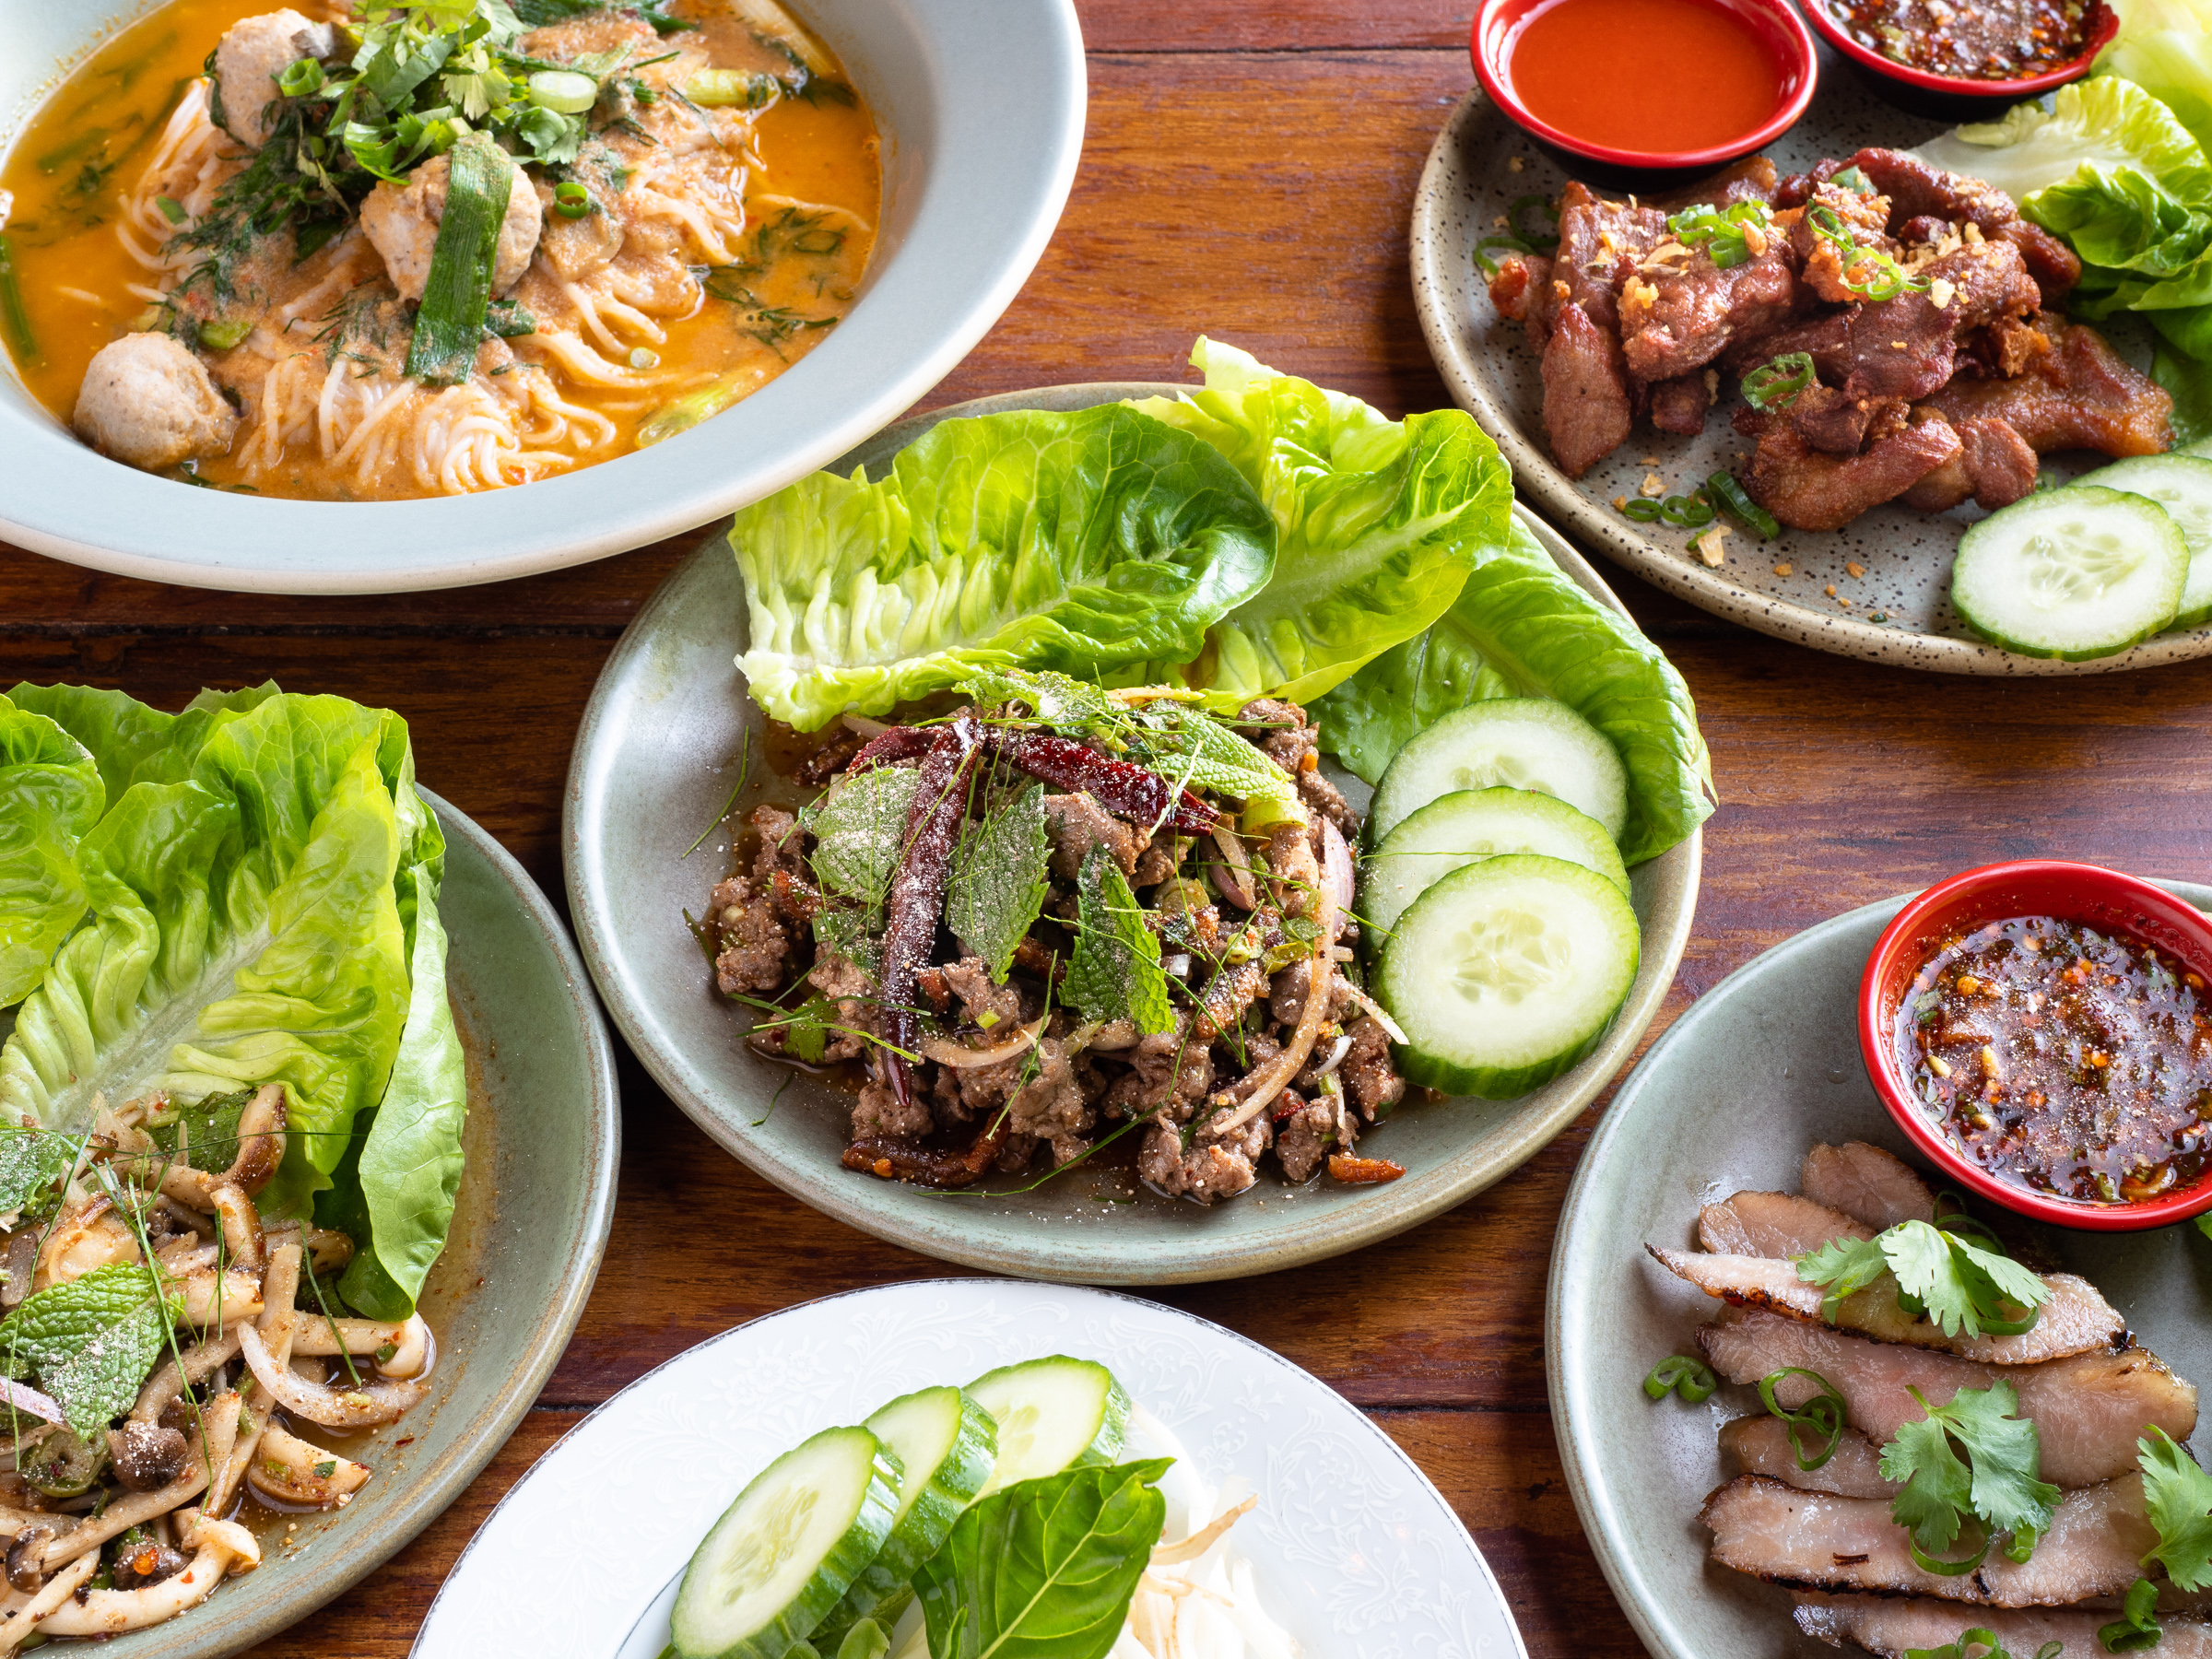 kosmos bbq sauce jeremy pawlowski portland oregon texas food photographer photography restaurant paadee larb